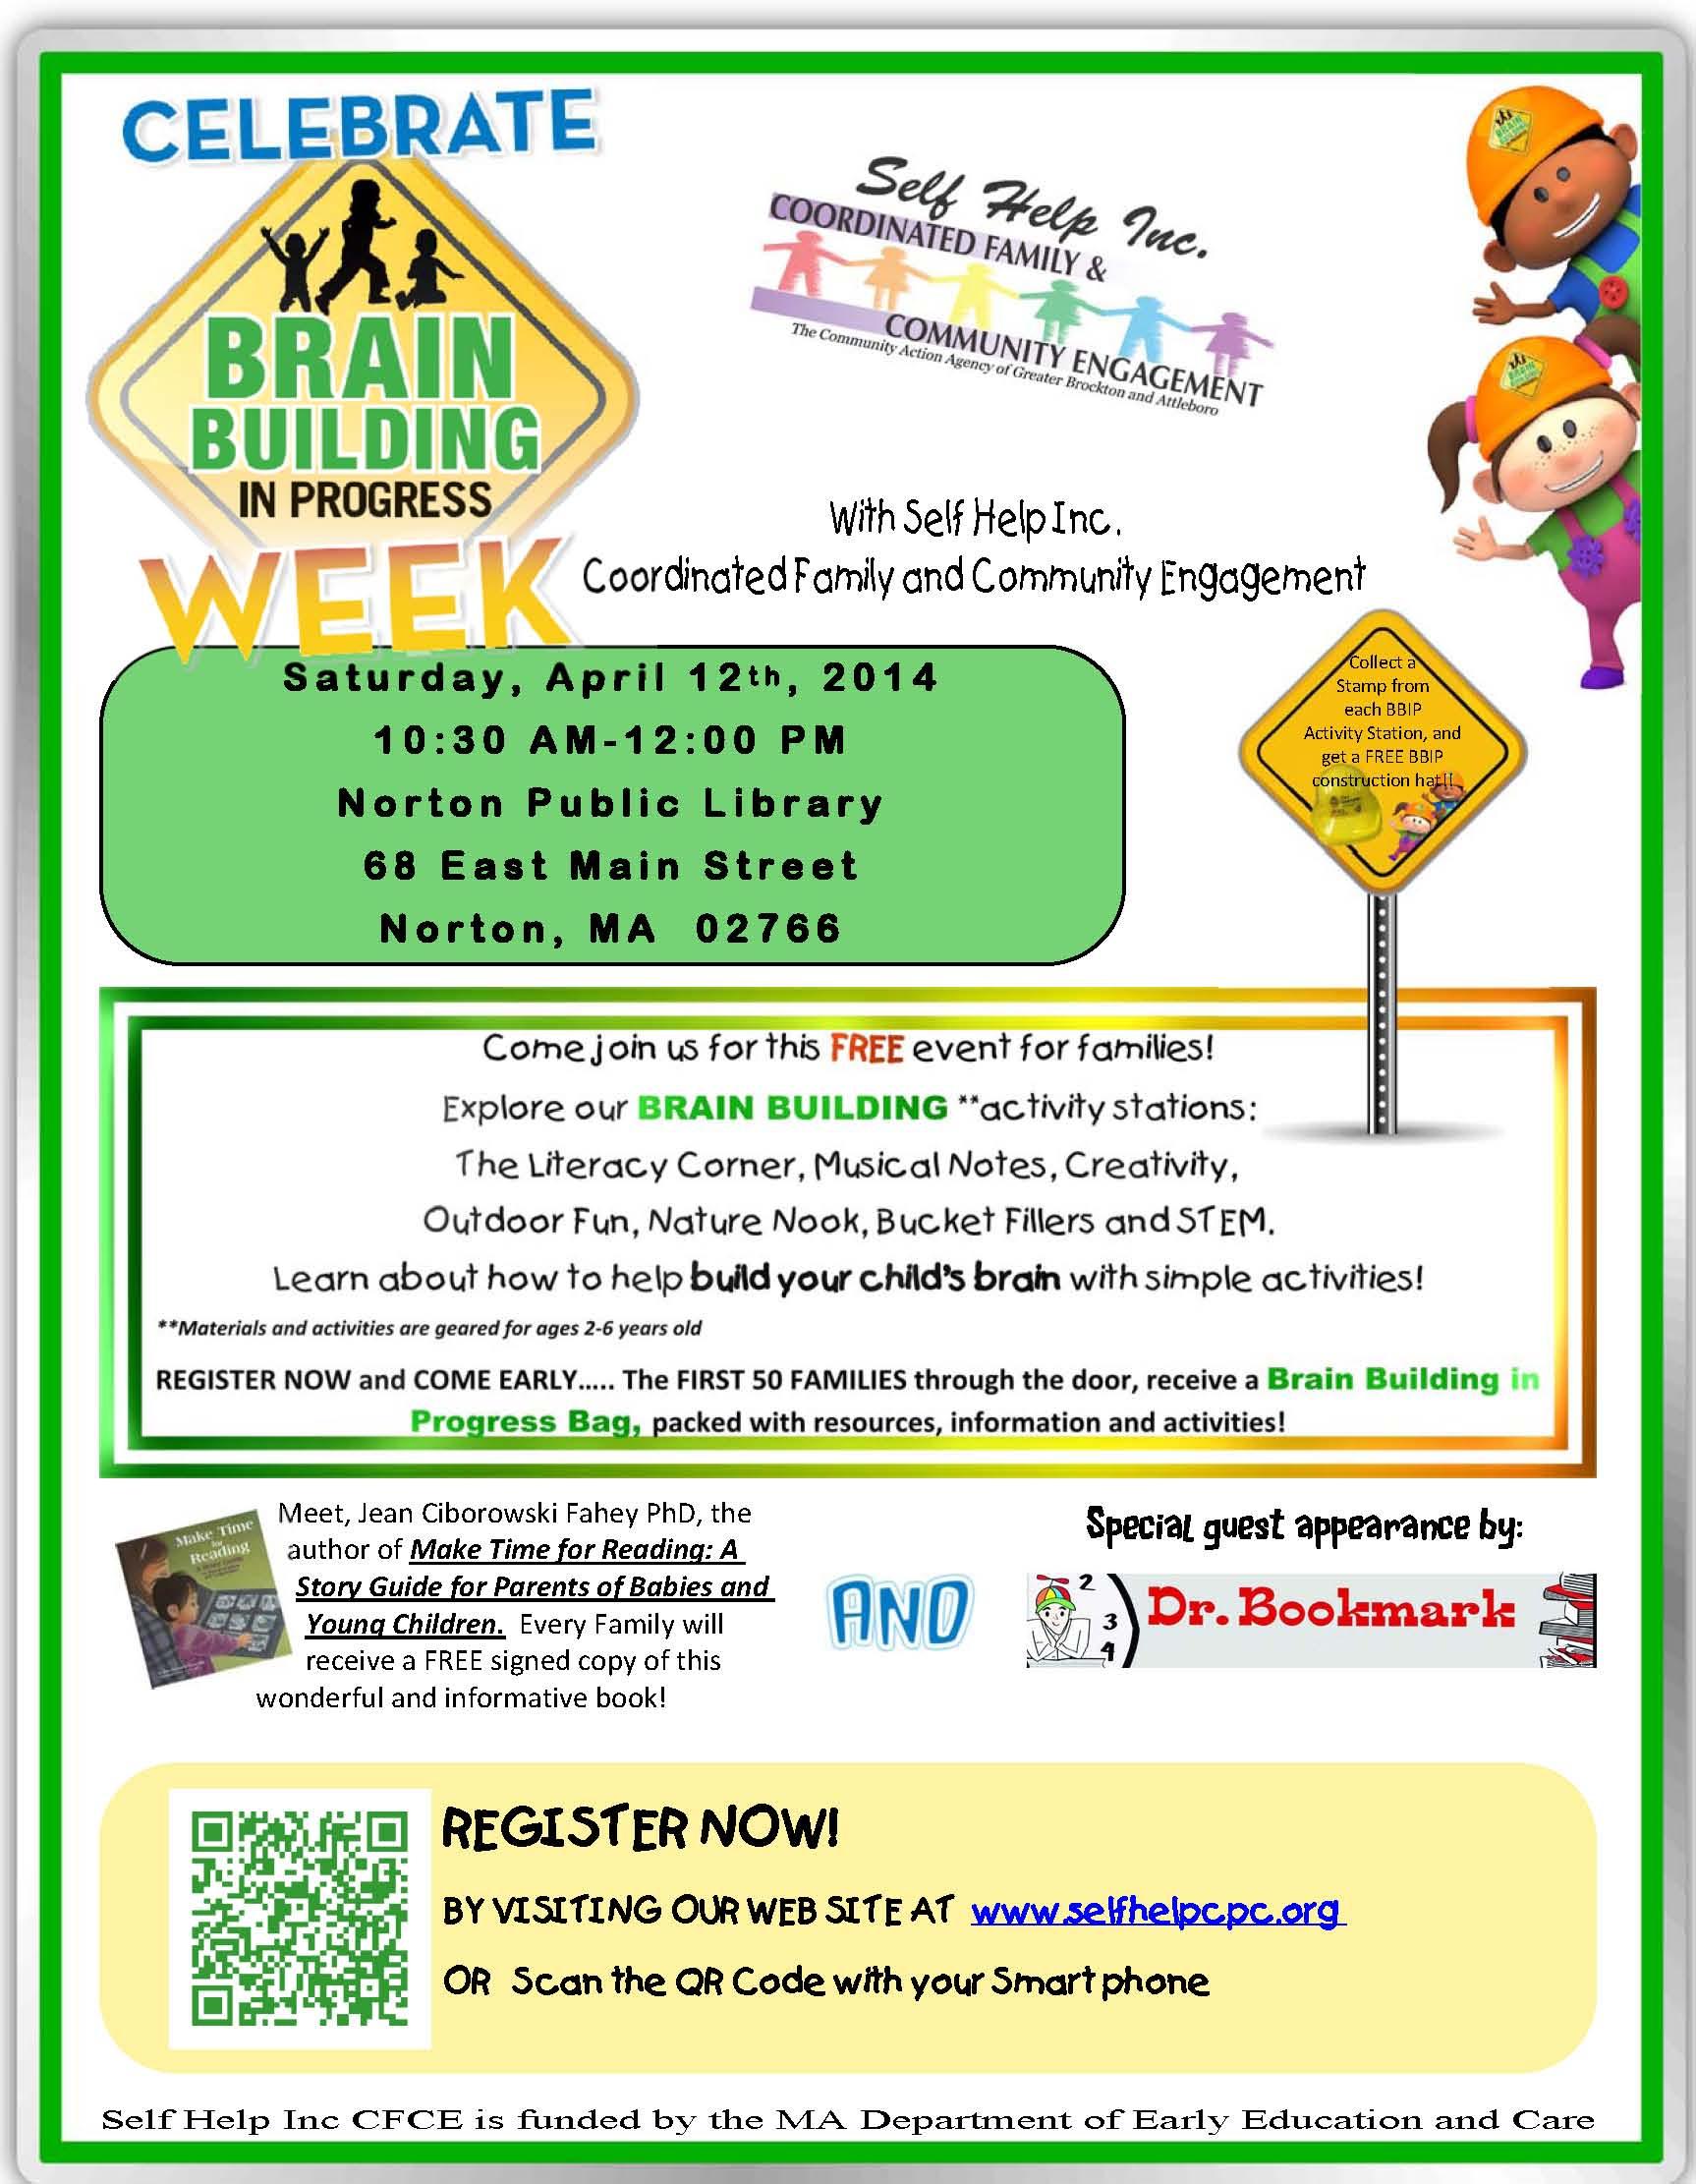 BBIP Event Flyer fy 2014